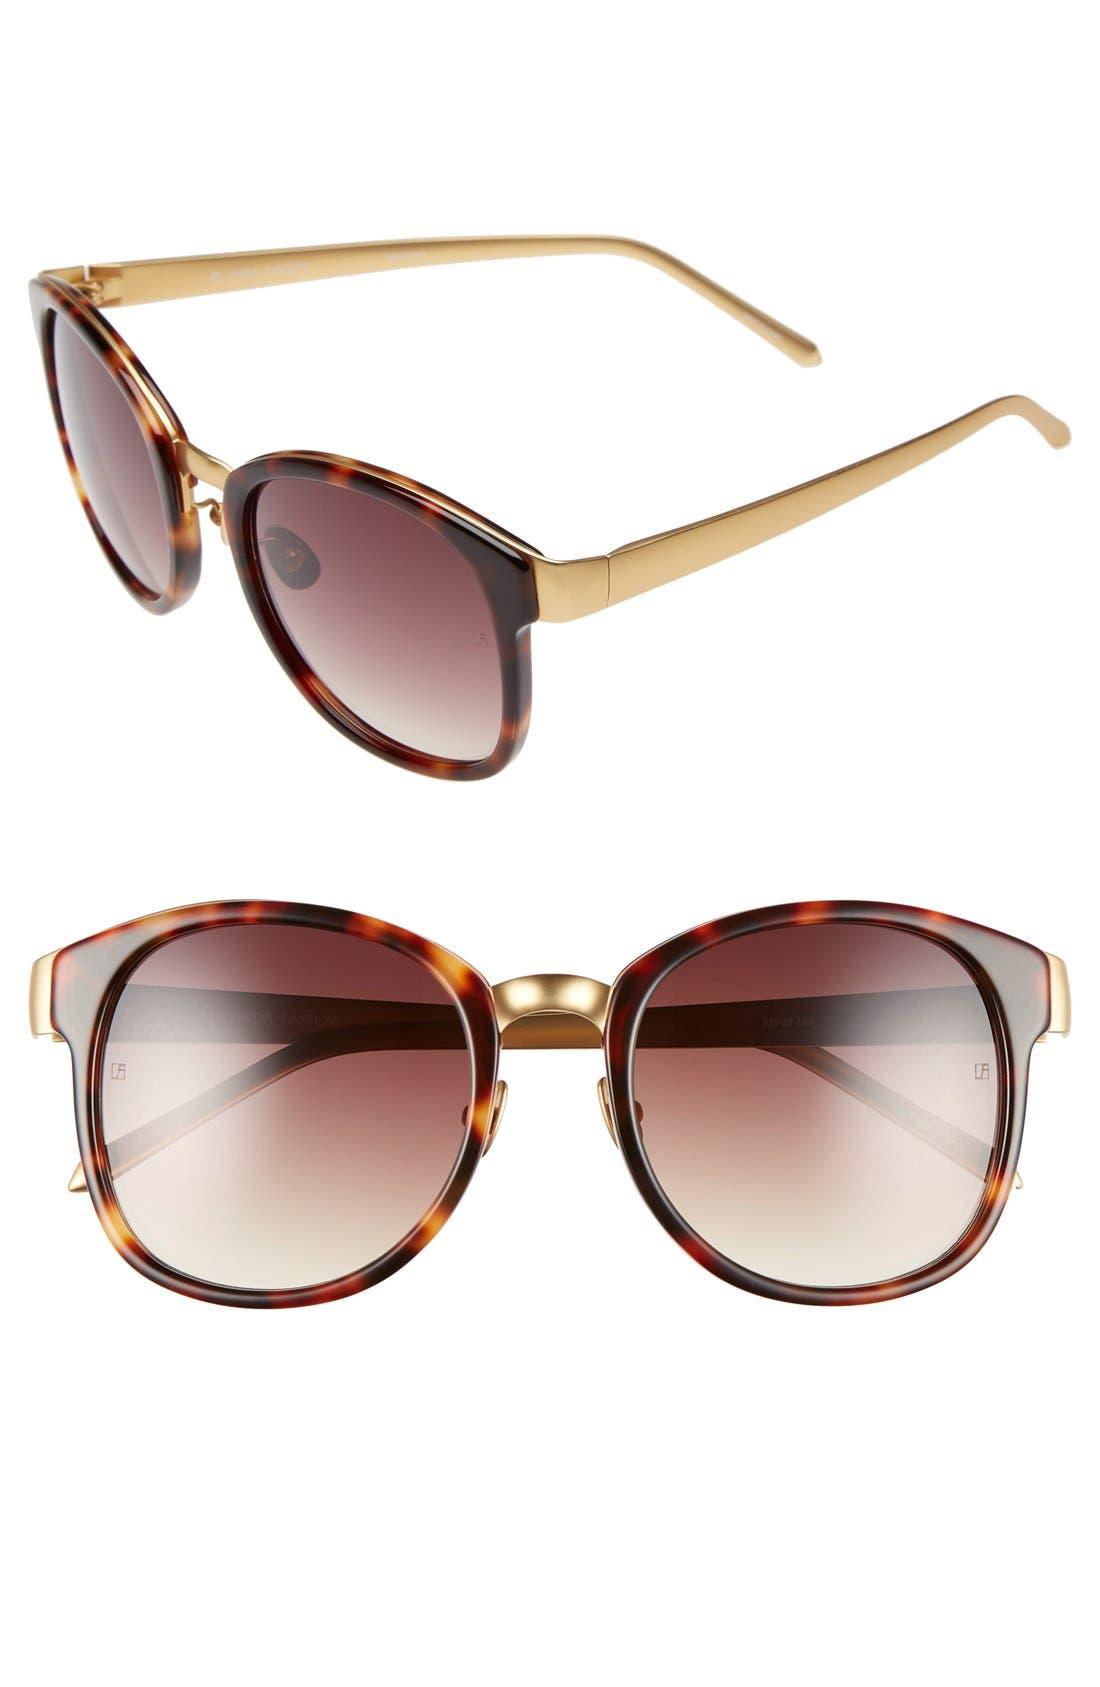 D-Frame 52mm 24 Karat Gold Trim Sunglasses,                         Main,                         color, Tortoise/ Brown Grad